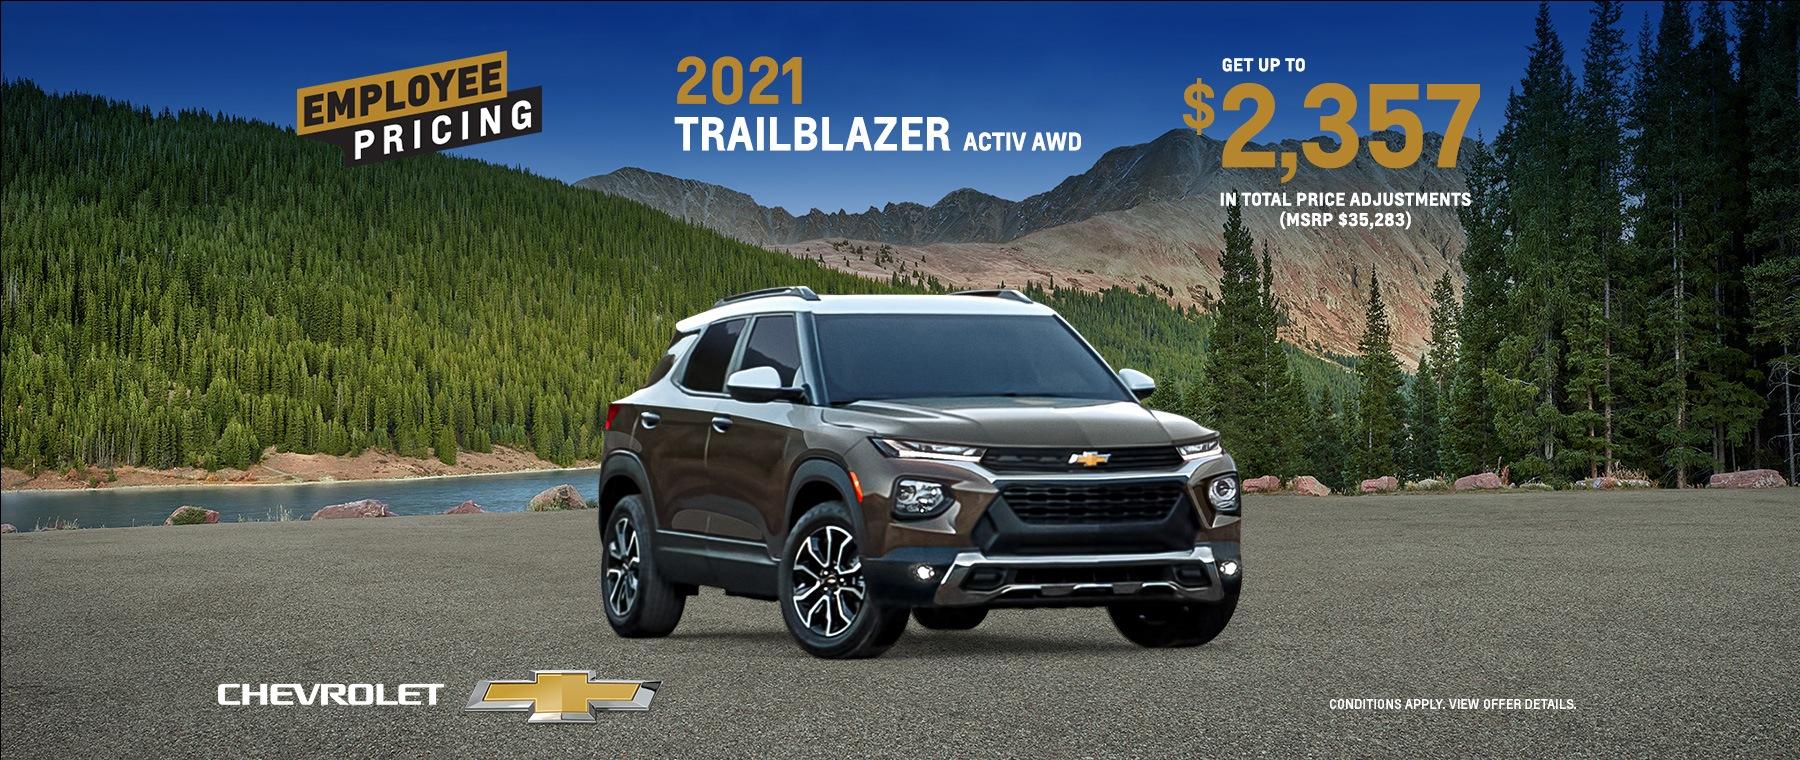 Employee Pricing – 2021 Chevrolet Trailblazer